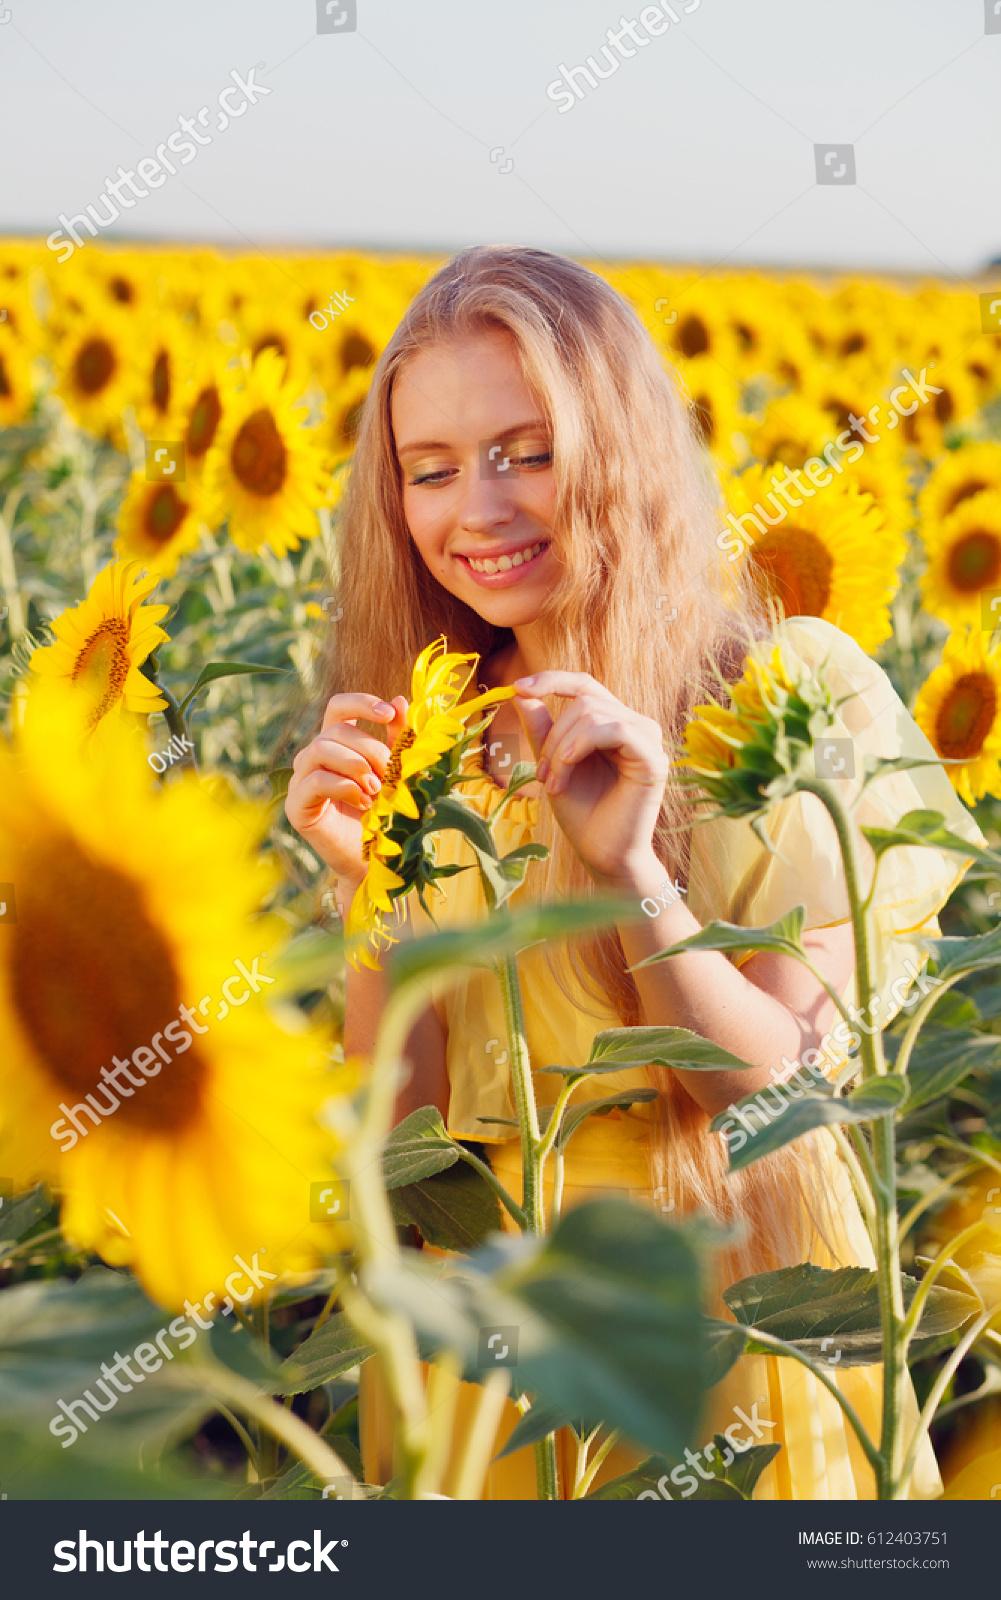 Blonde Girl Sunflower Yellow Dress Sunflower Stock Photo Edit Now